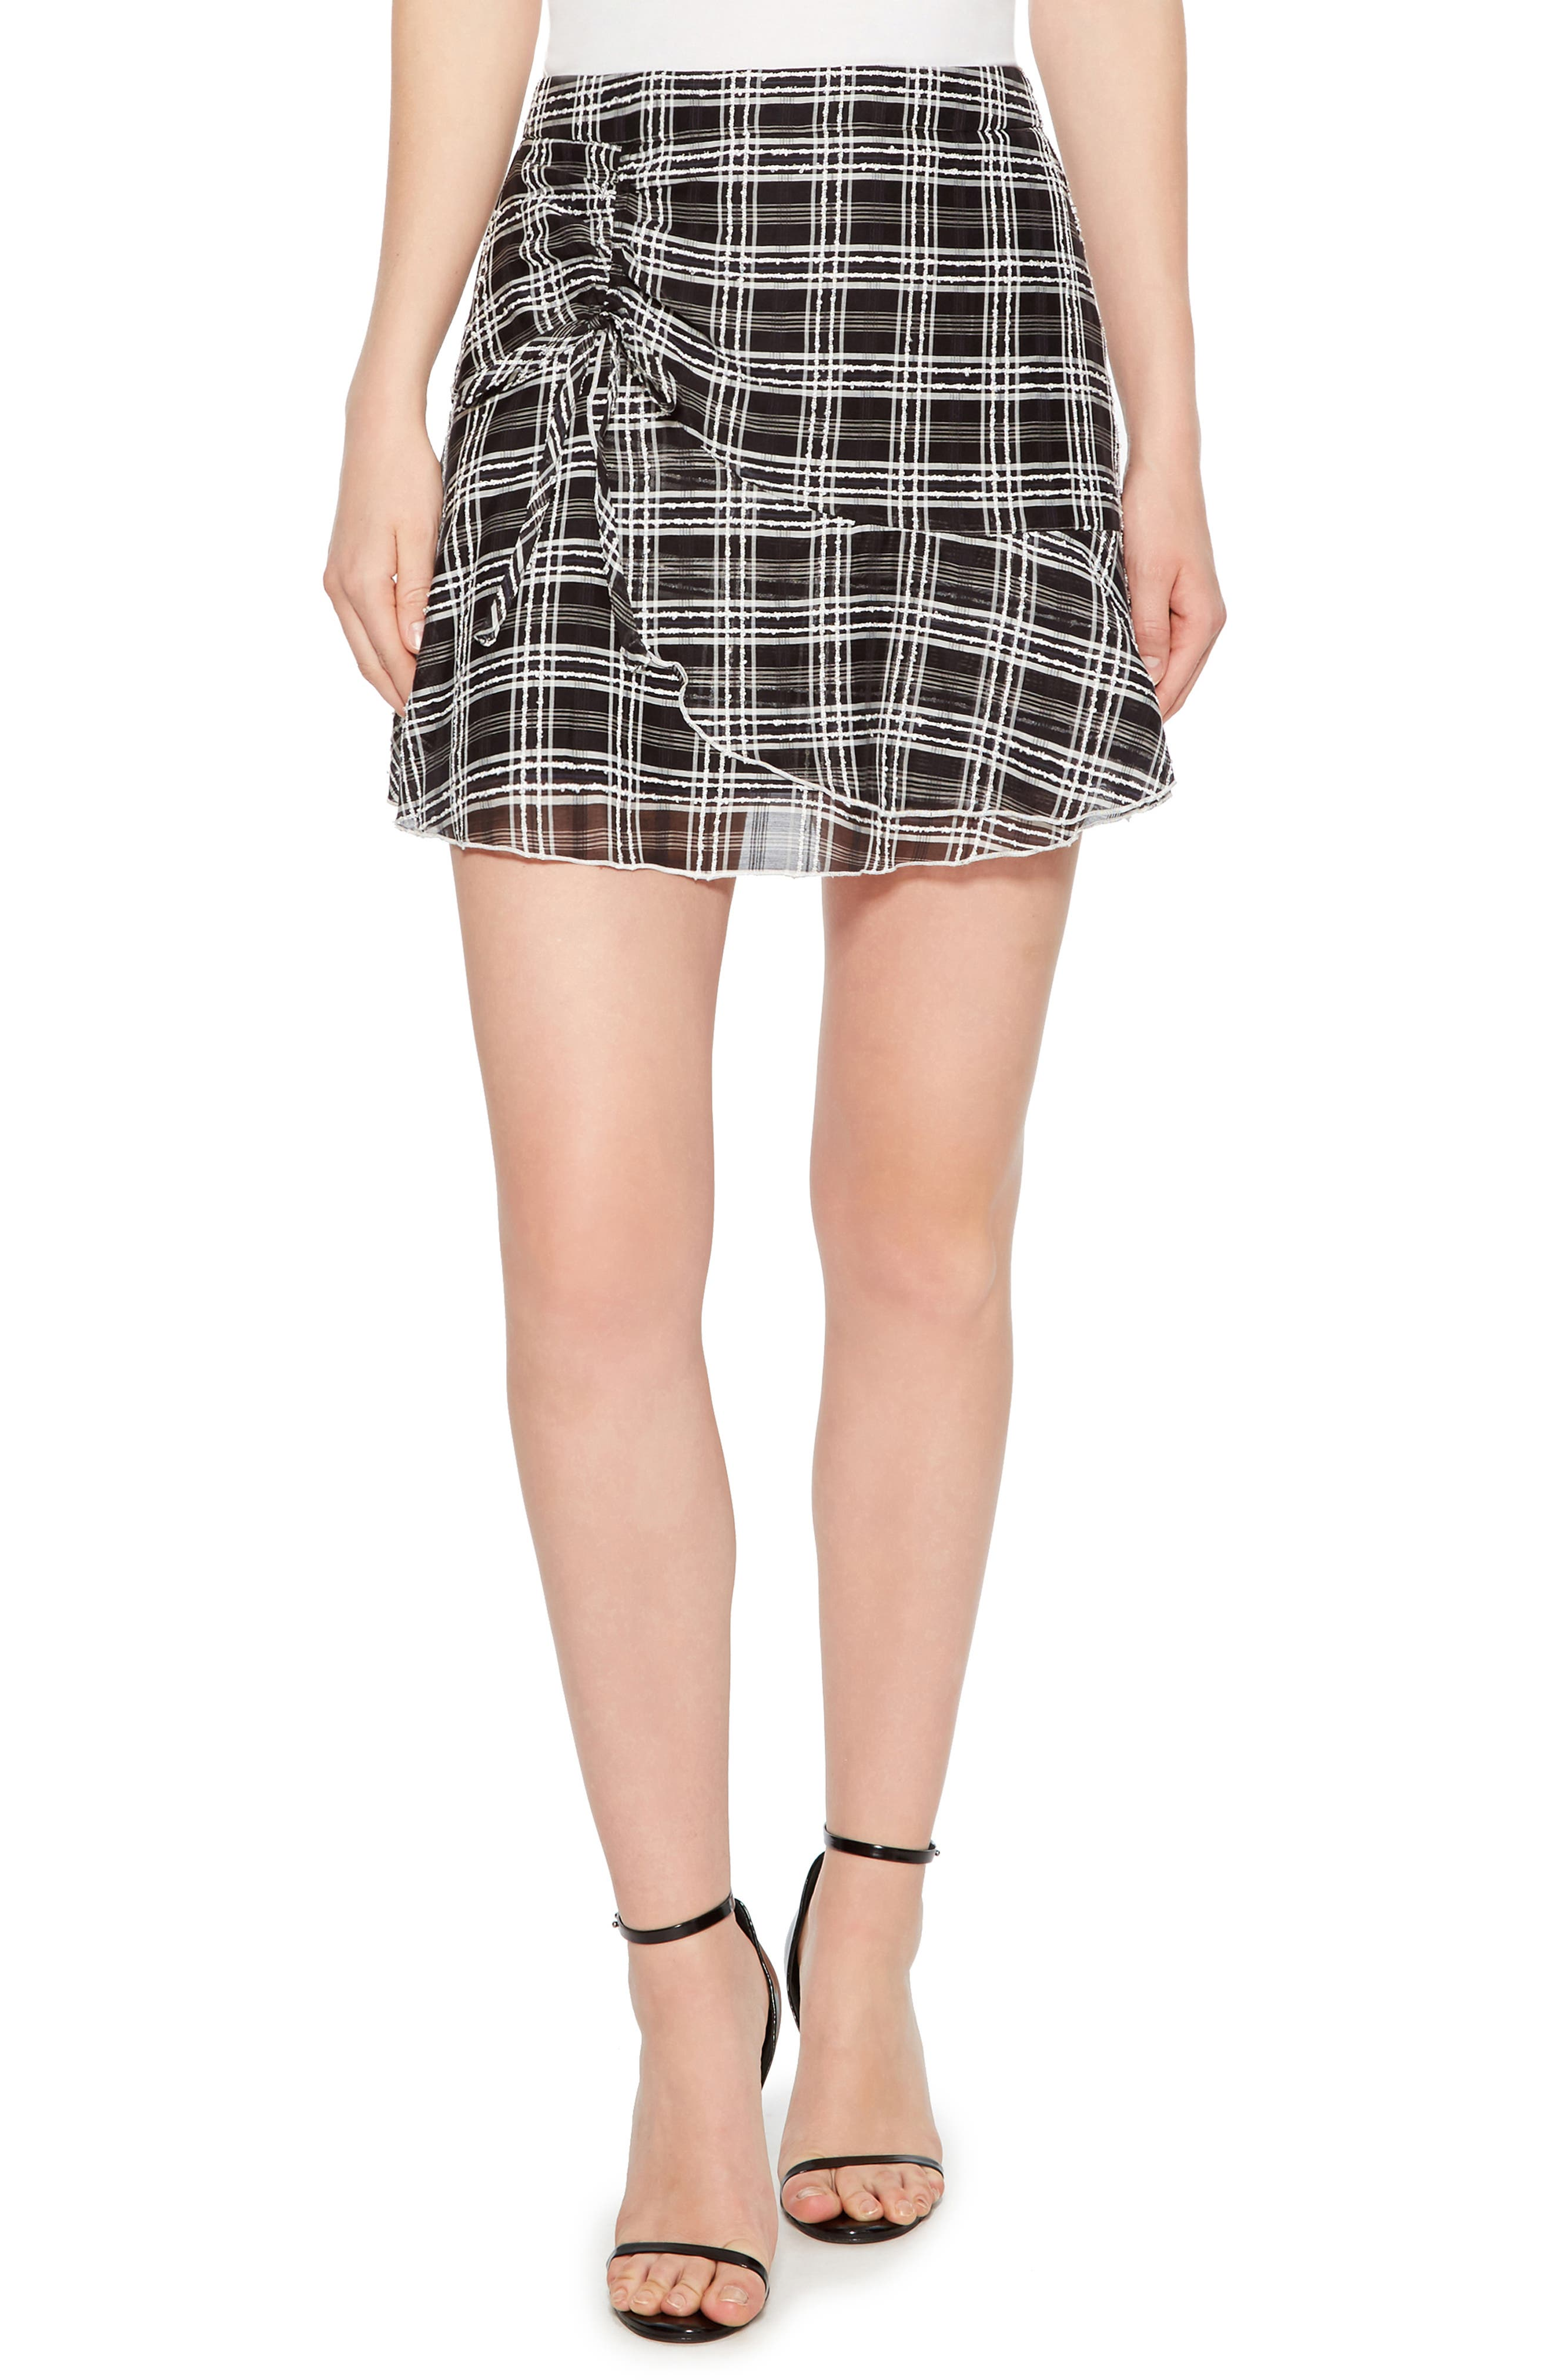 Chris Side Ruched Miniskirt,                             Main thumbnail 1, color,                             BLACK/ WHITE